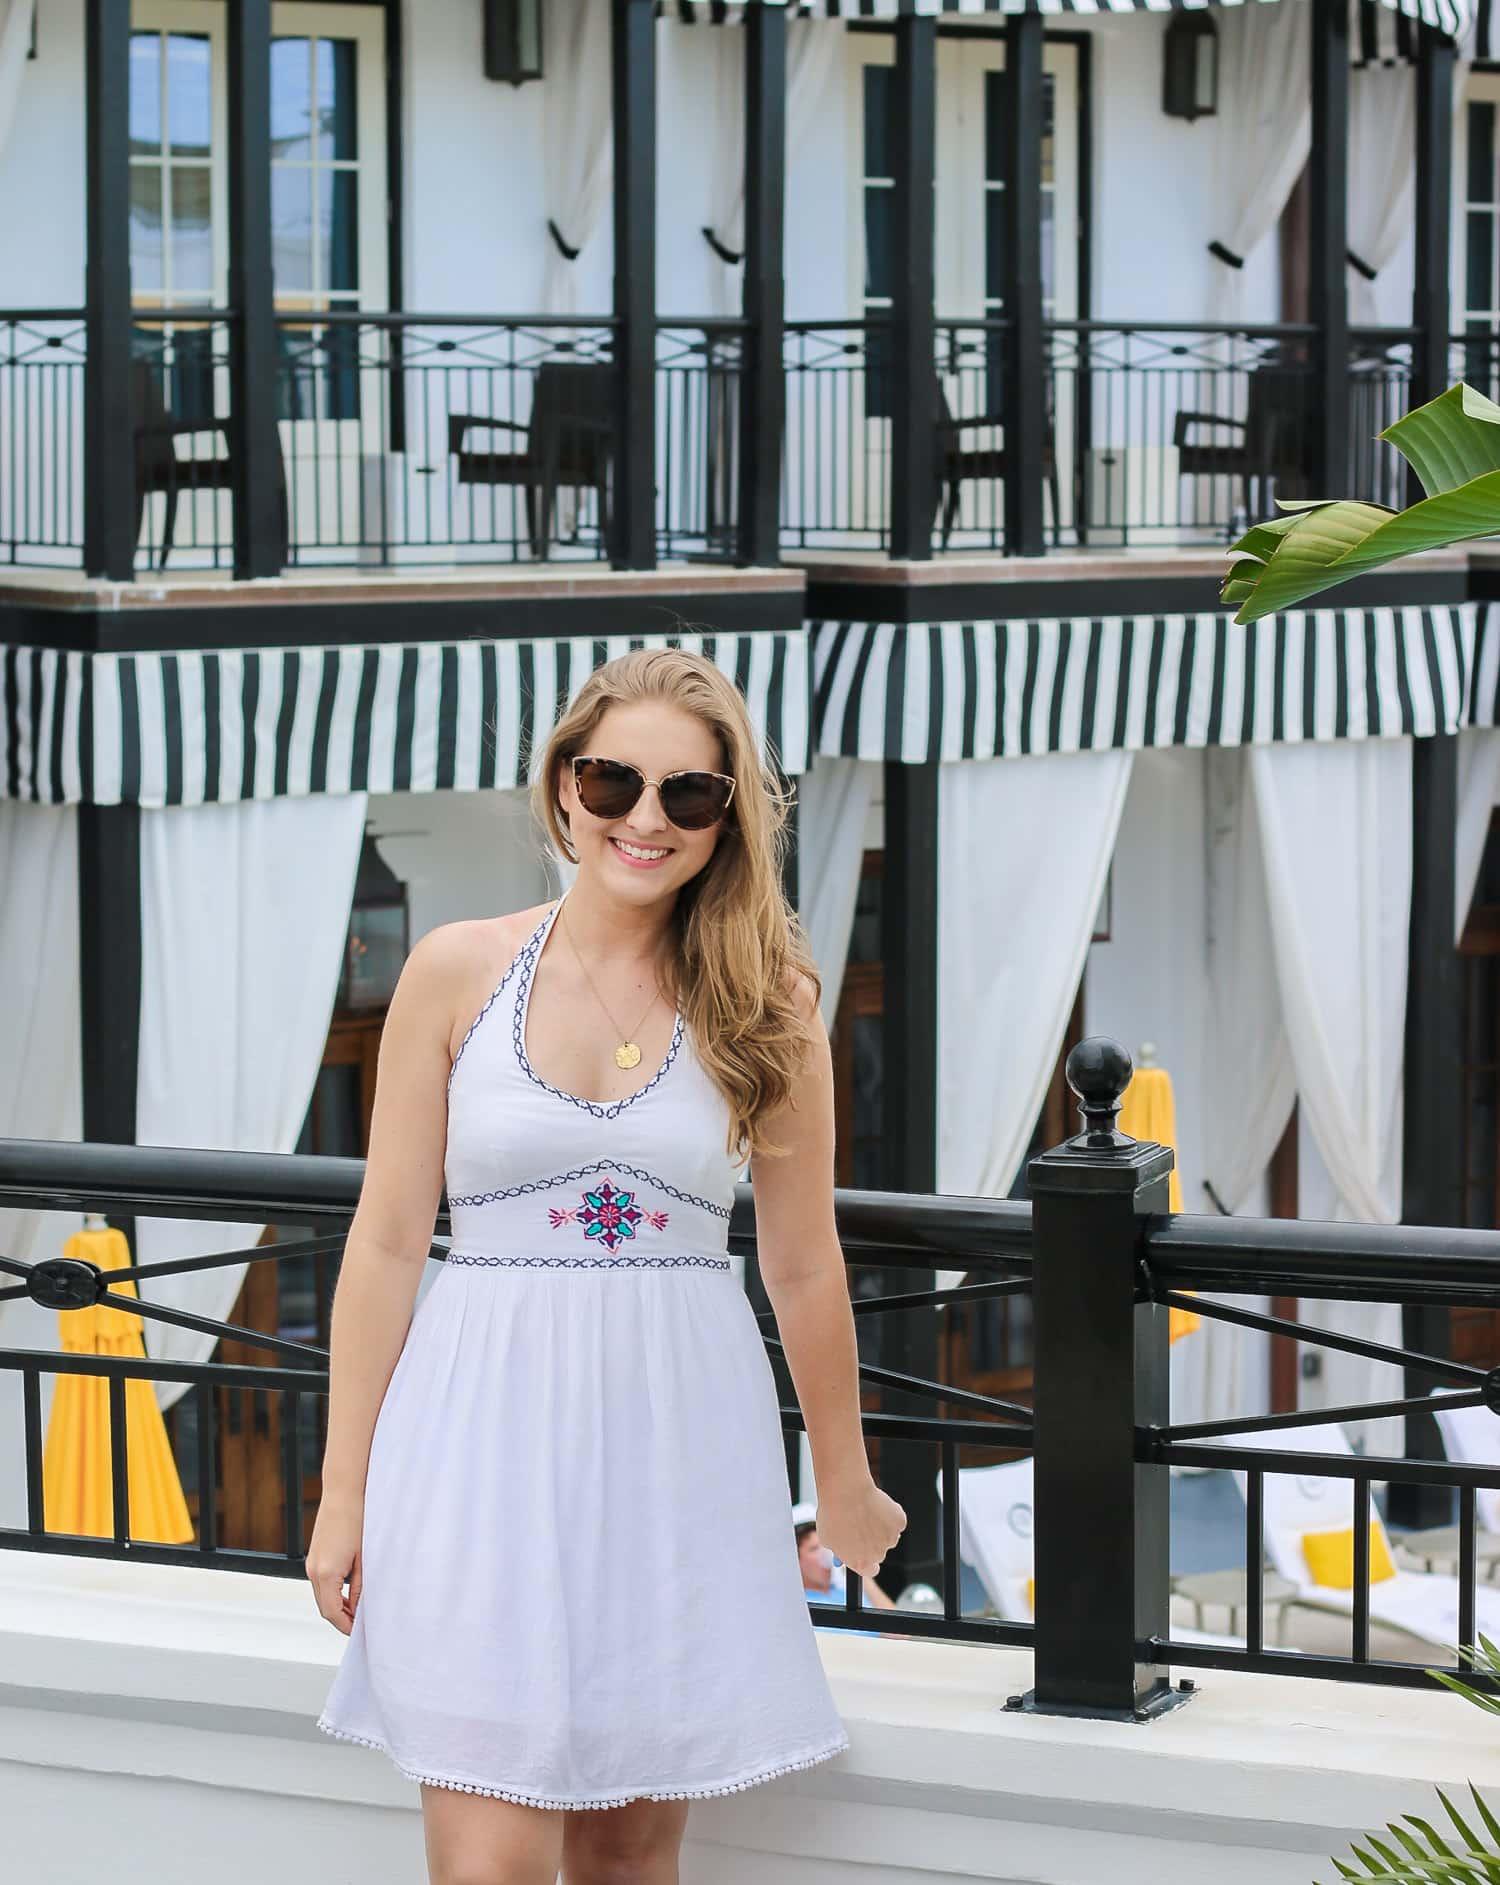 the-pearl-hotel-rosemary-beach-florida-0456